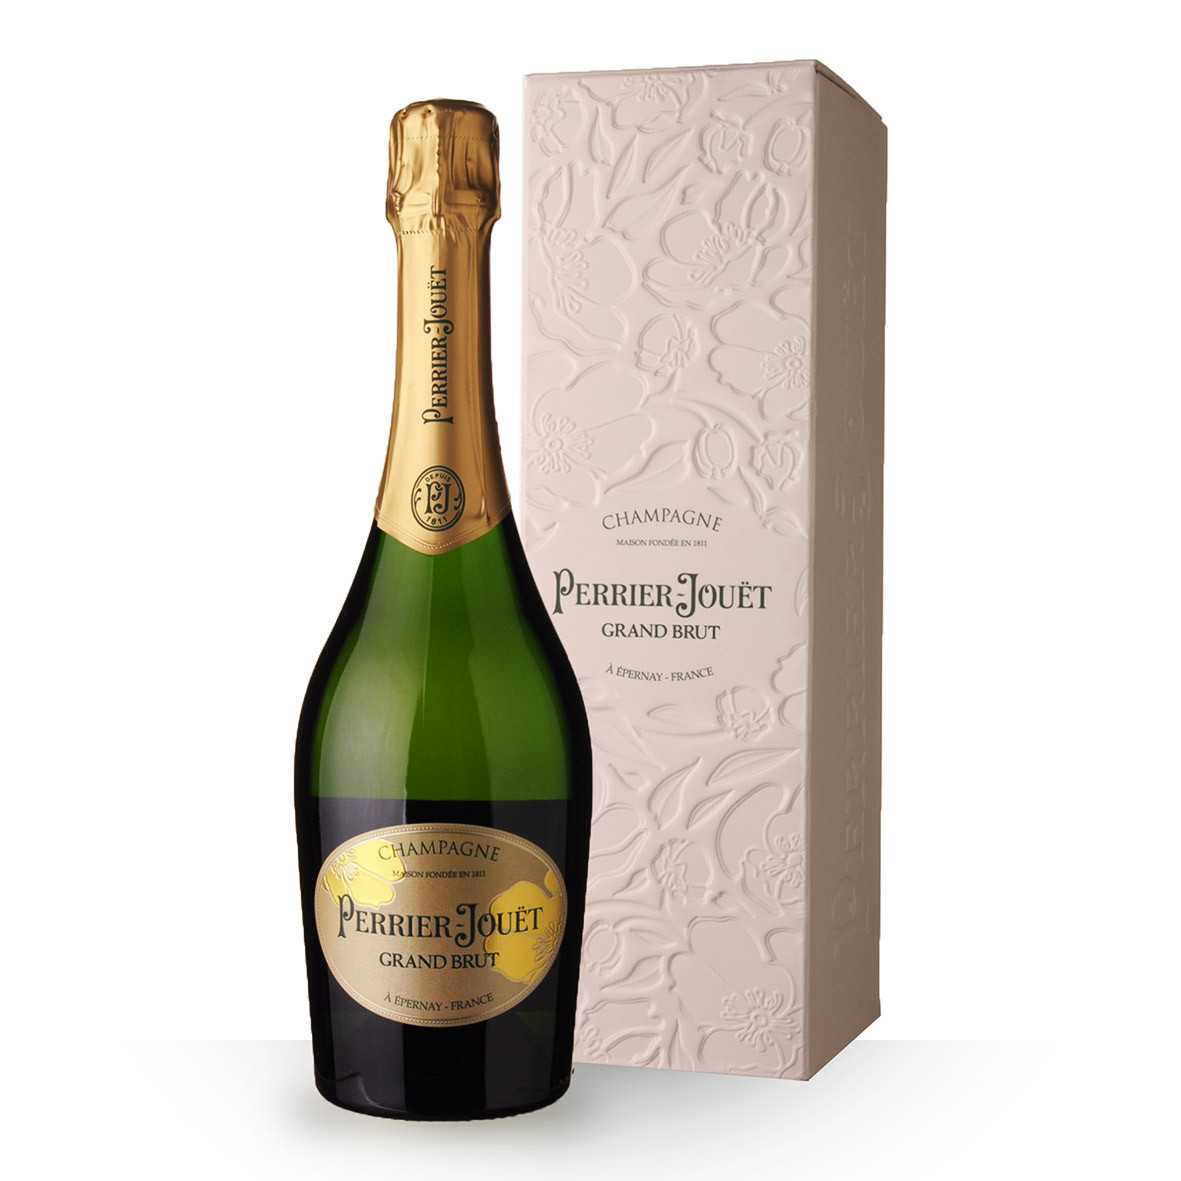 Champagne Perrier-Jouët Grand Brut 75cl Etui www.odyssee-vins.com